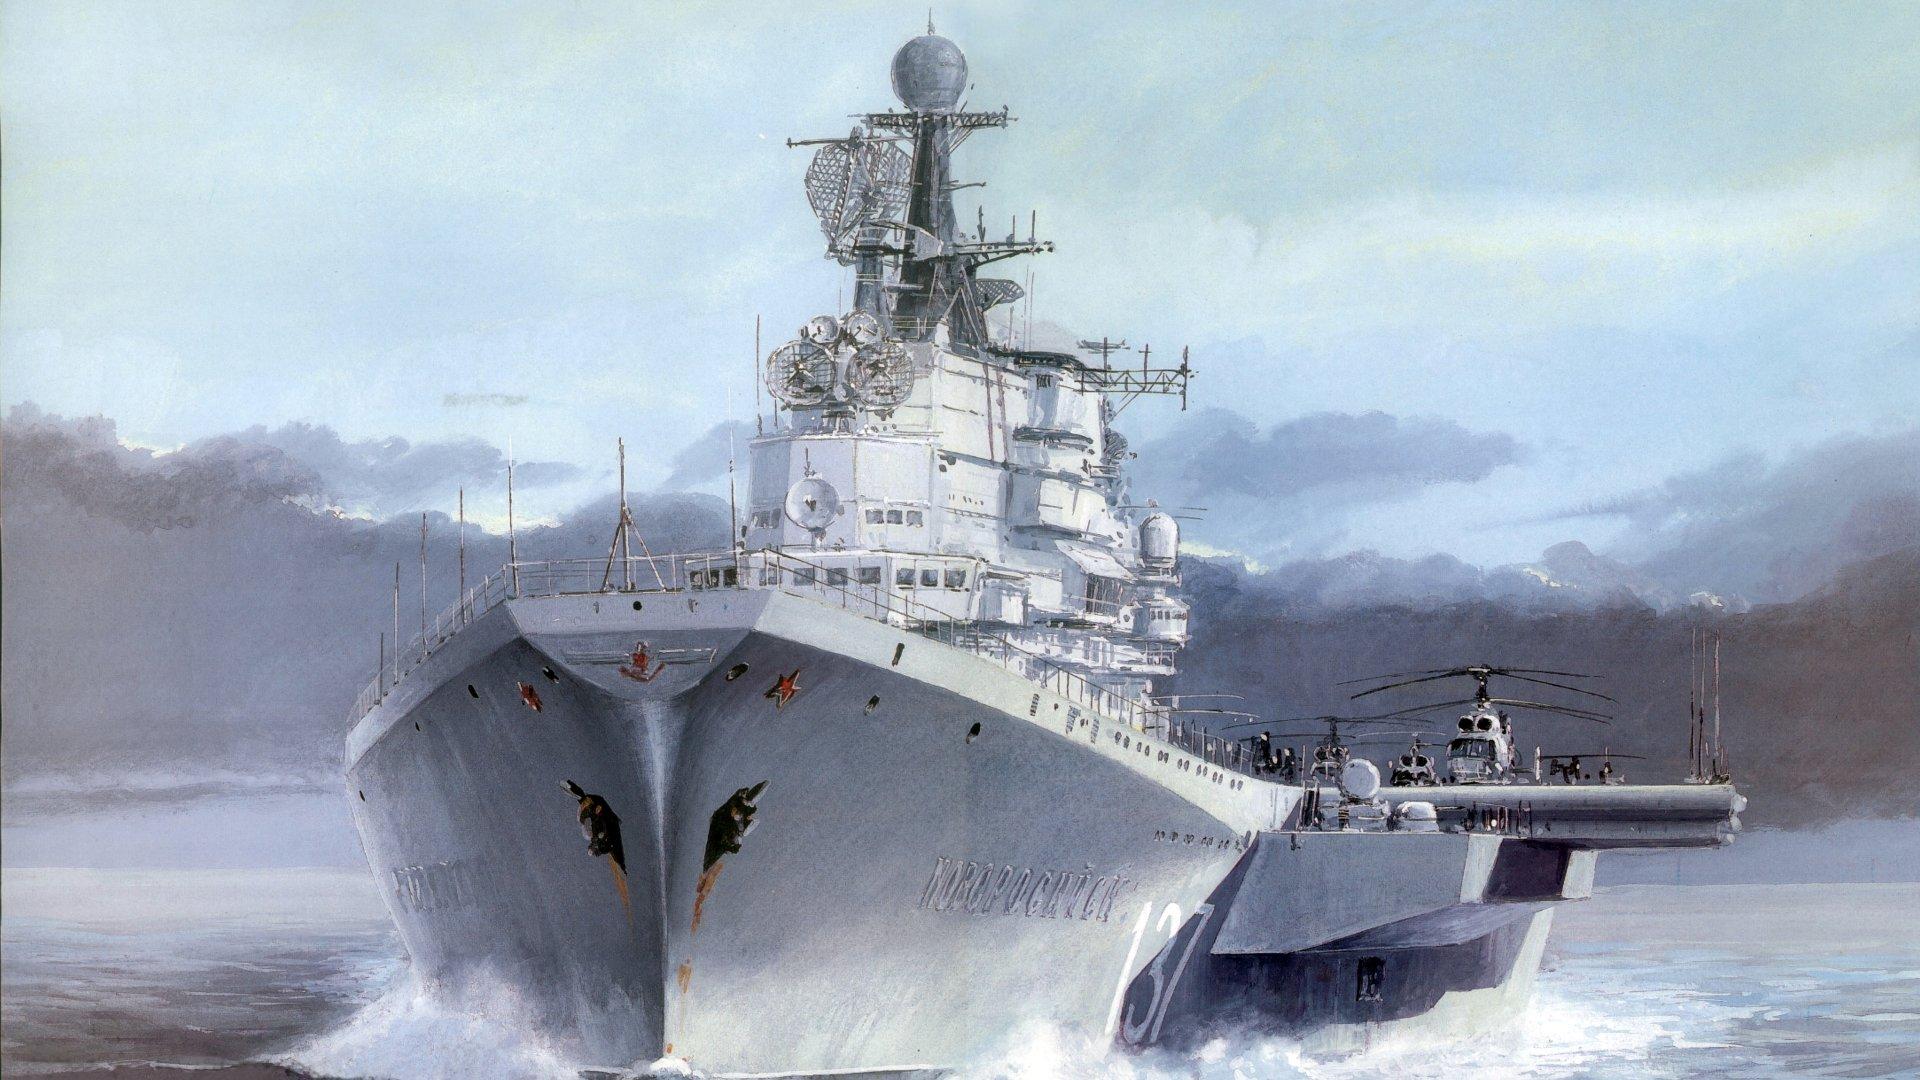 Russian navy 4k ultra hd wallpaper background image 4900x2757 id 518459 wallpaper abyss - 4k wallpaper russia ...